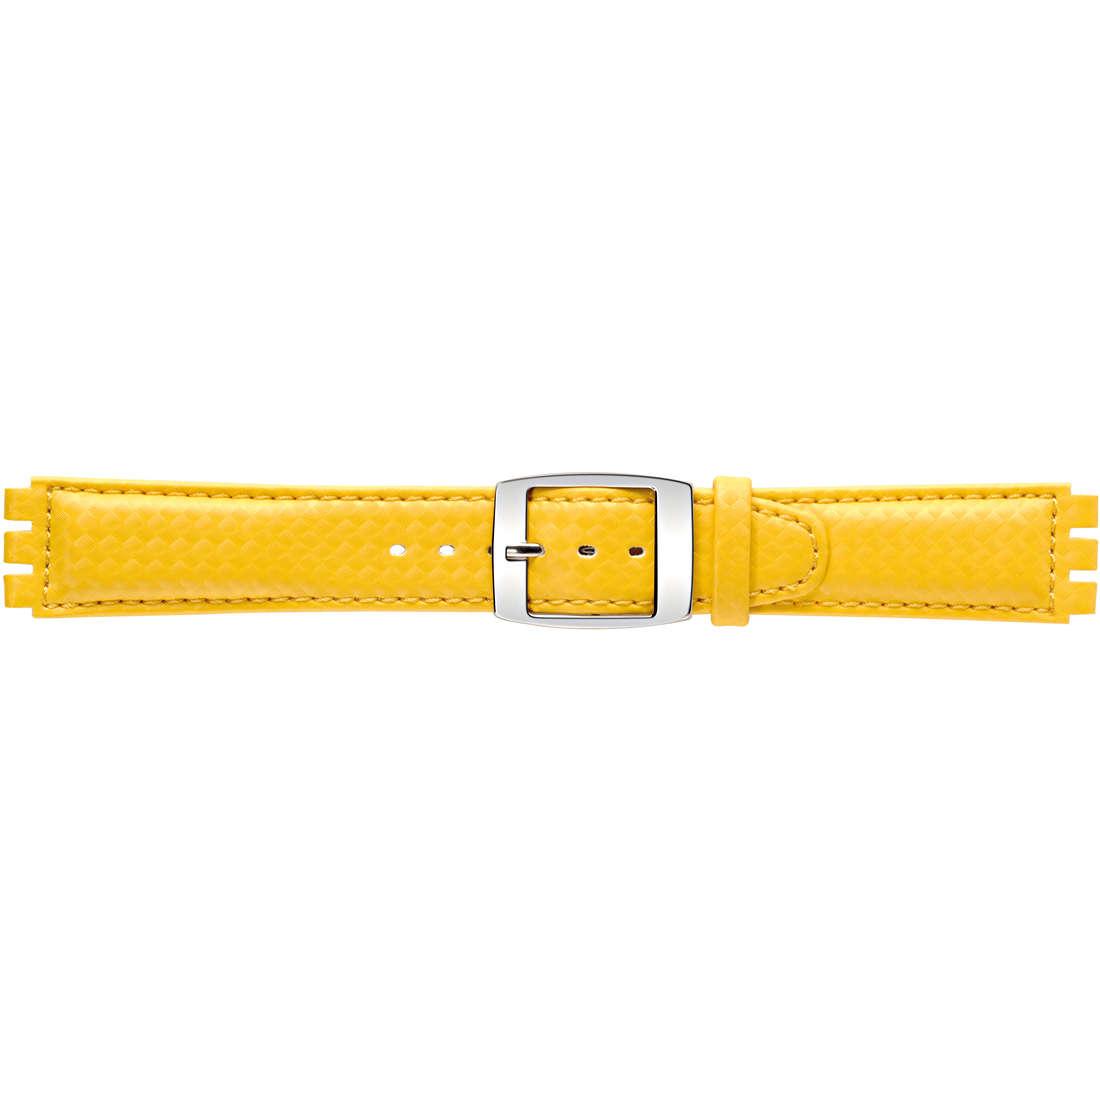 watch watch bands watch straps man Morellato Swatch A01U2740640755MO17